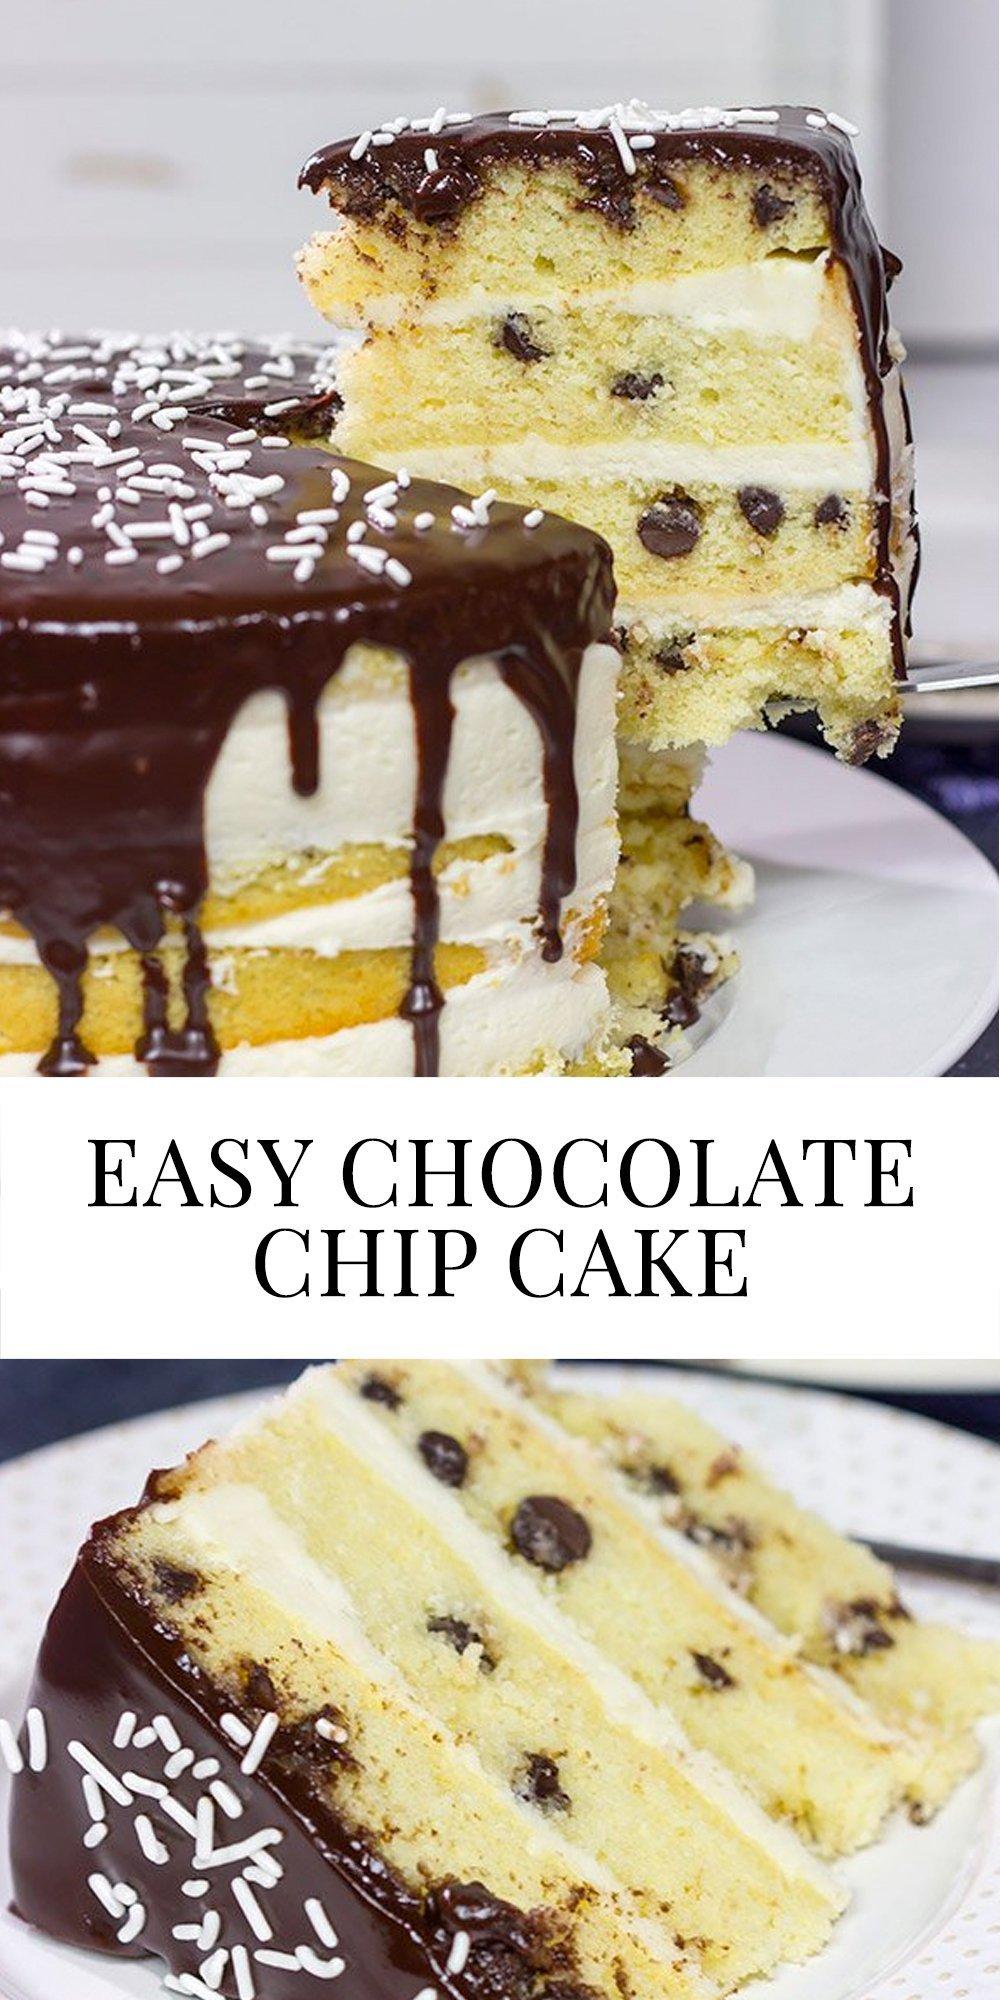 chocolate chip cake with chocolate glaze